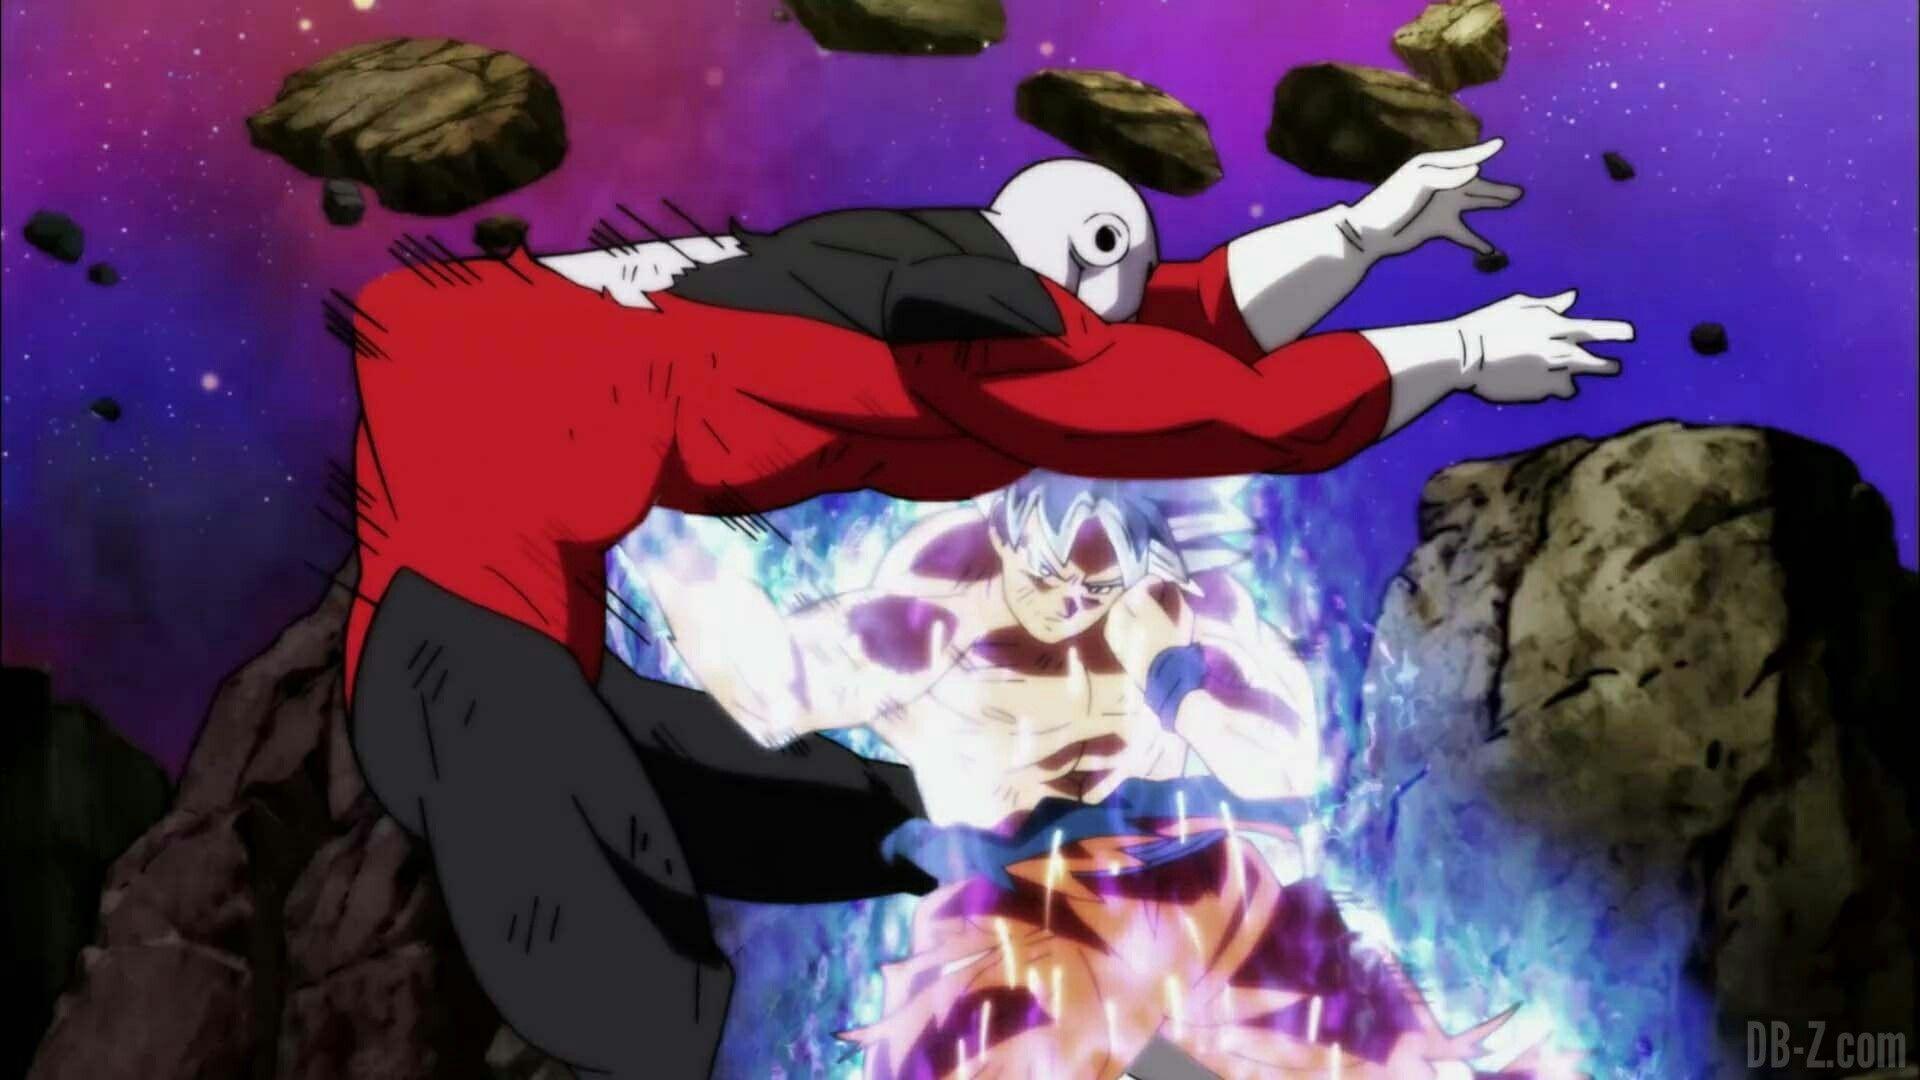 Goku Vs Jiren Goku Vs Jiren Goku Vs Dragon Ball Z